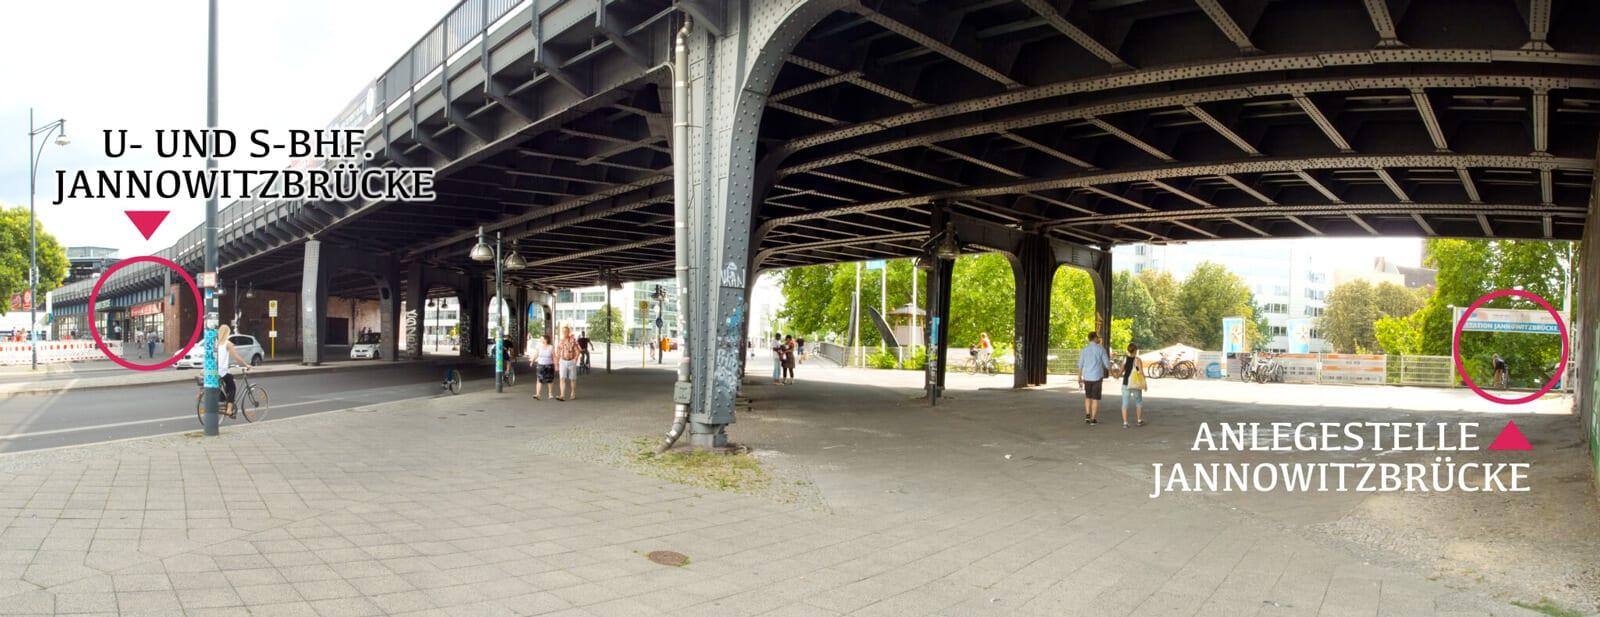 Anlegestelle Jannowitzbrücke - Wegbeschreibung